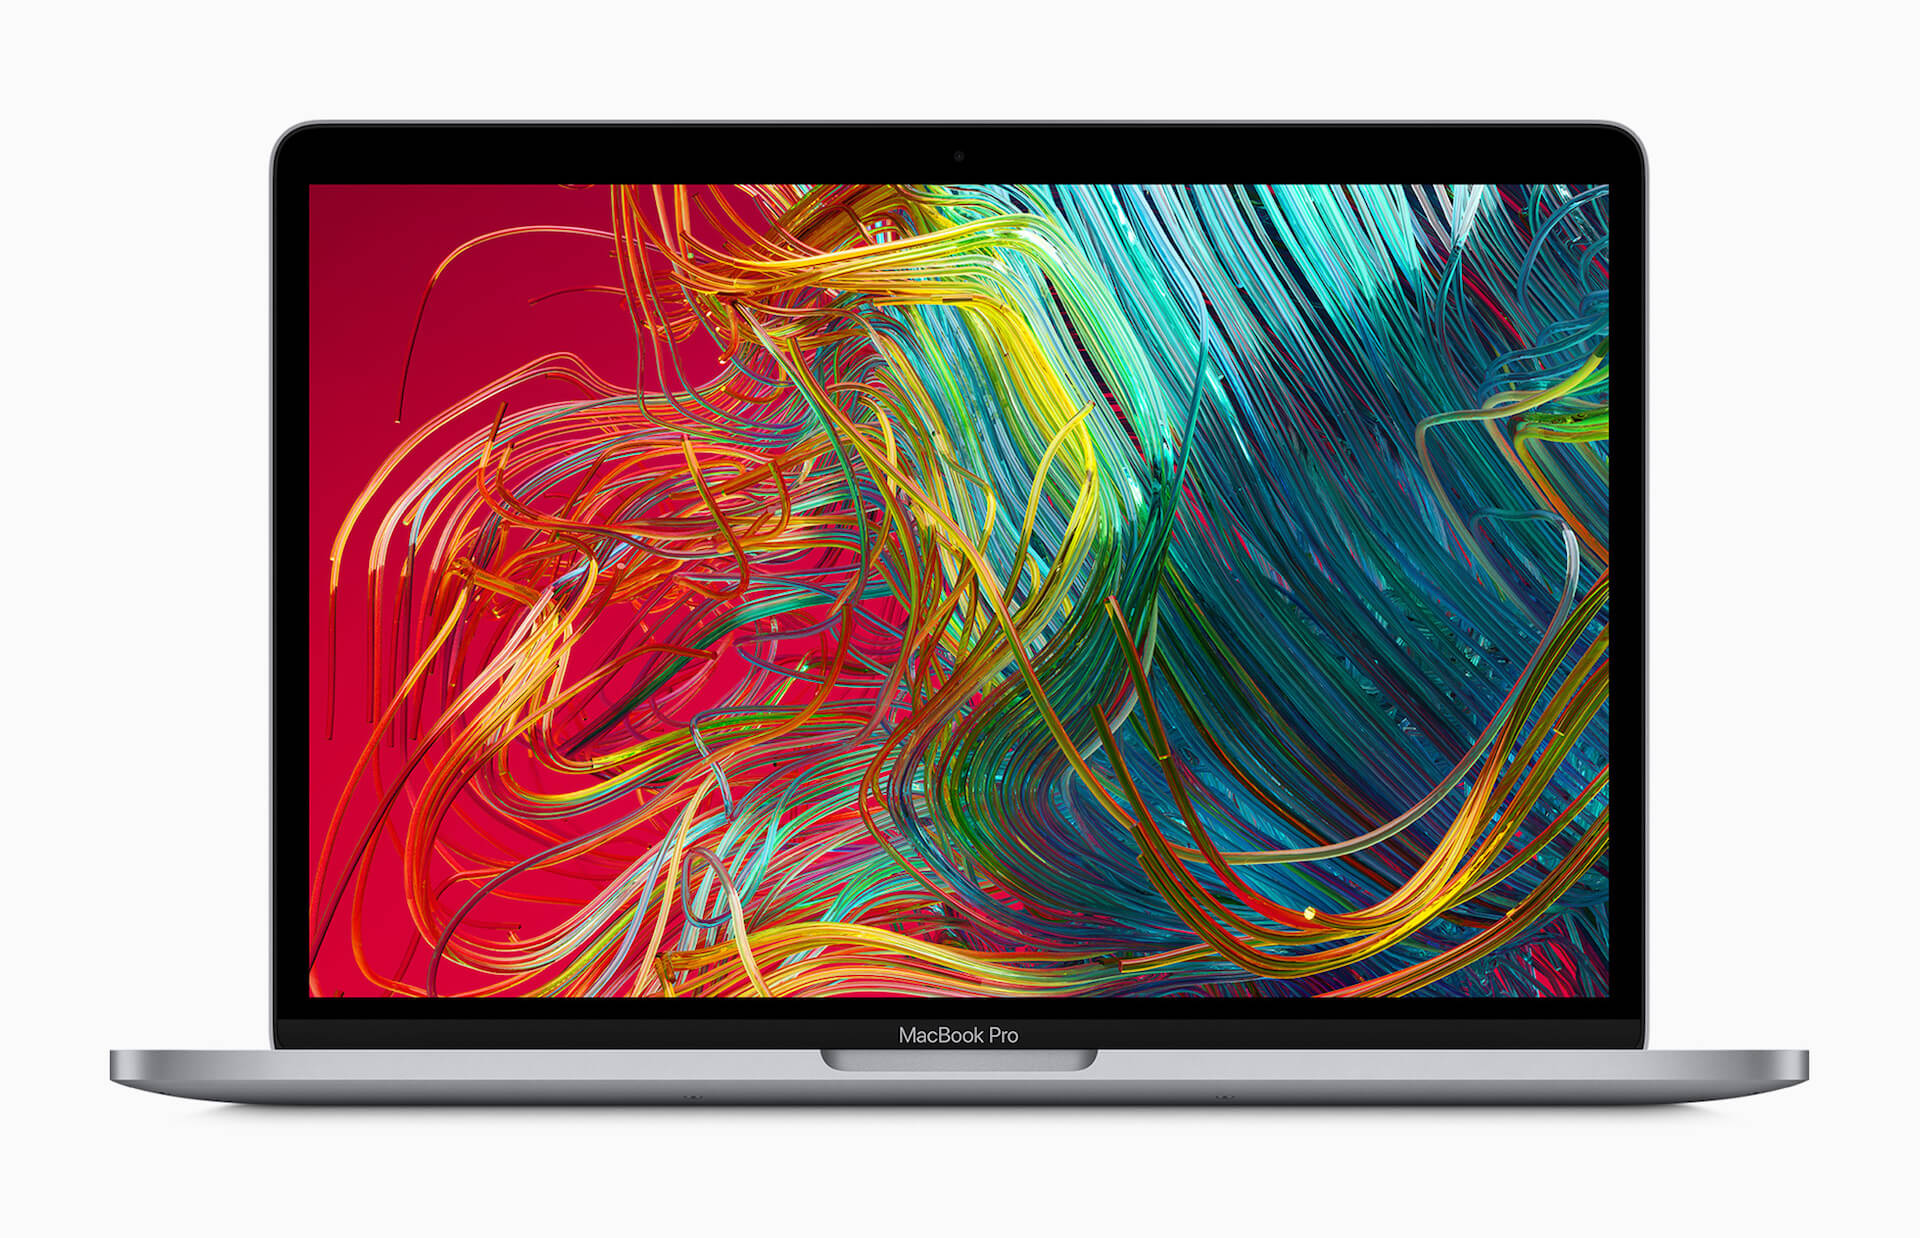 Face ID搭載のMacBookが近日中に登場!?6月開催の<WWDC>で発表の可能性 tech200518_macbook_1